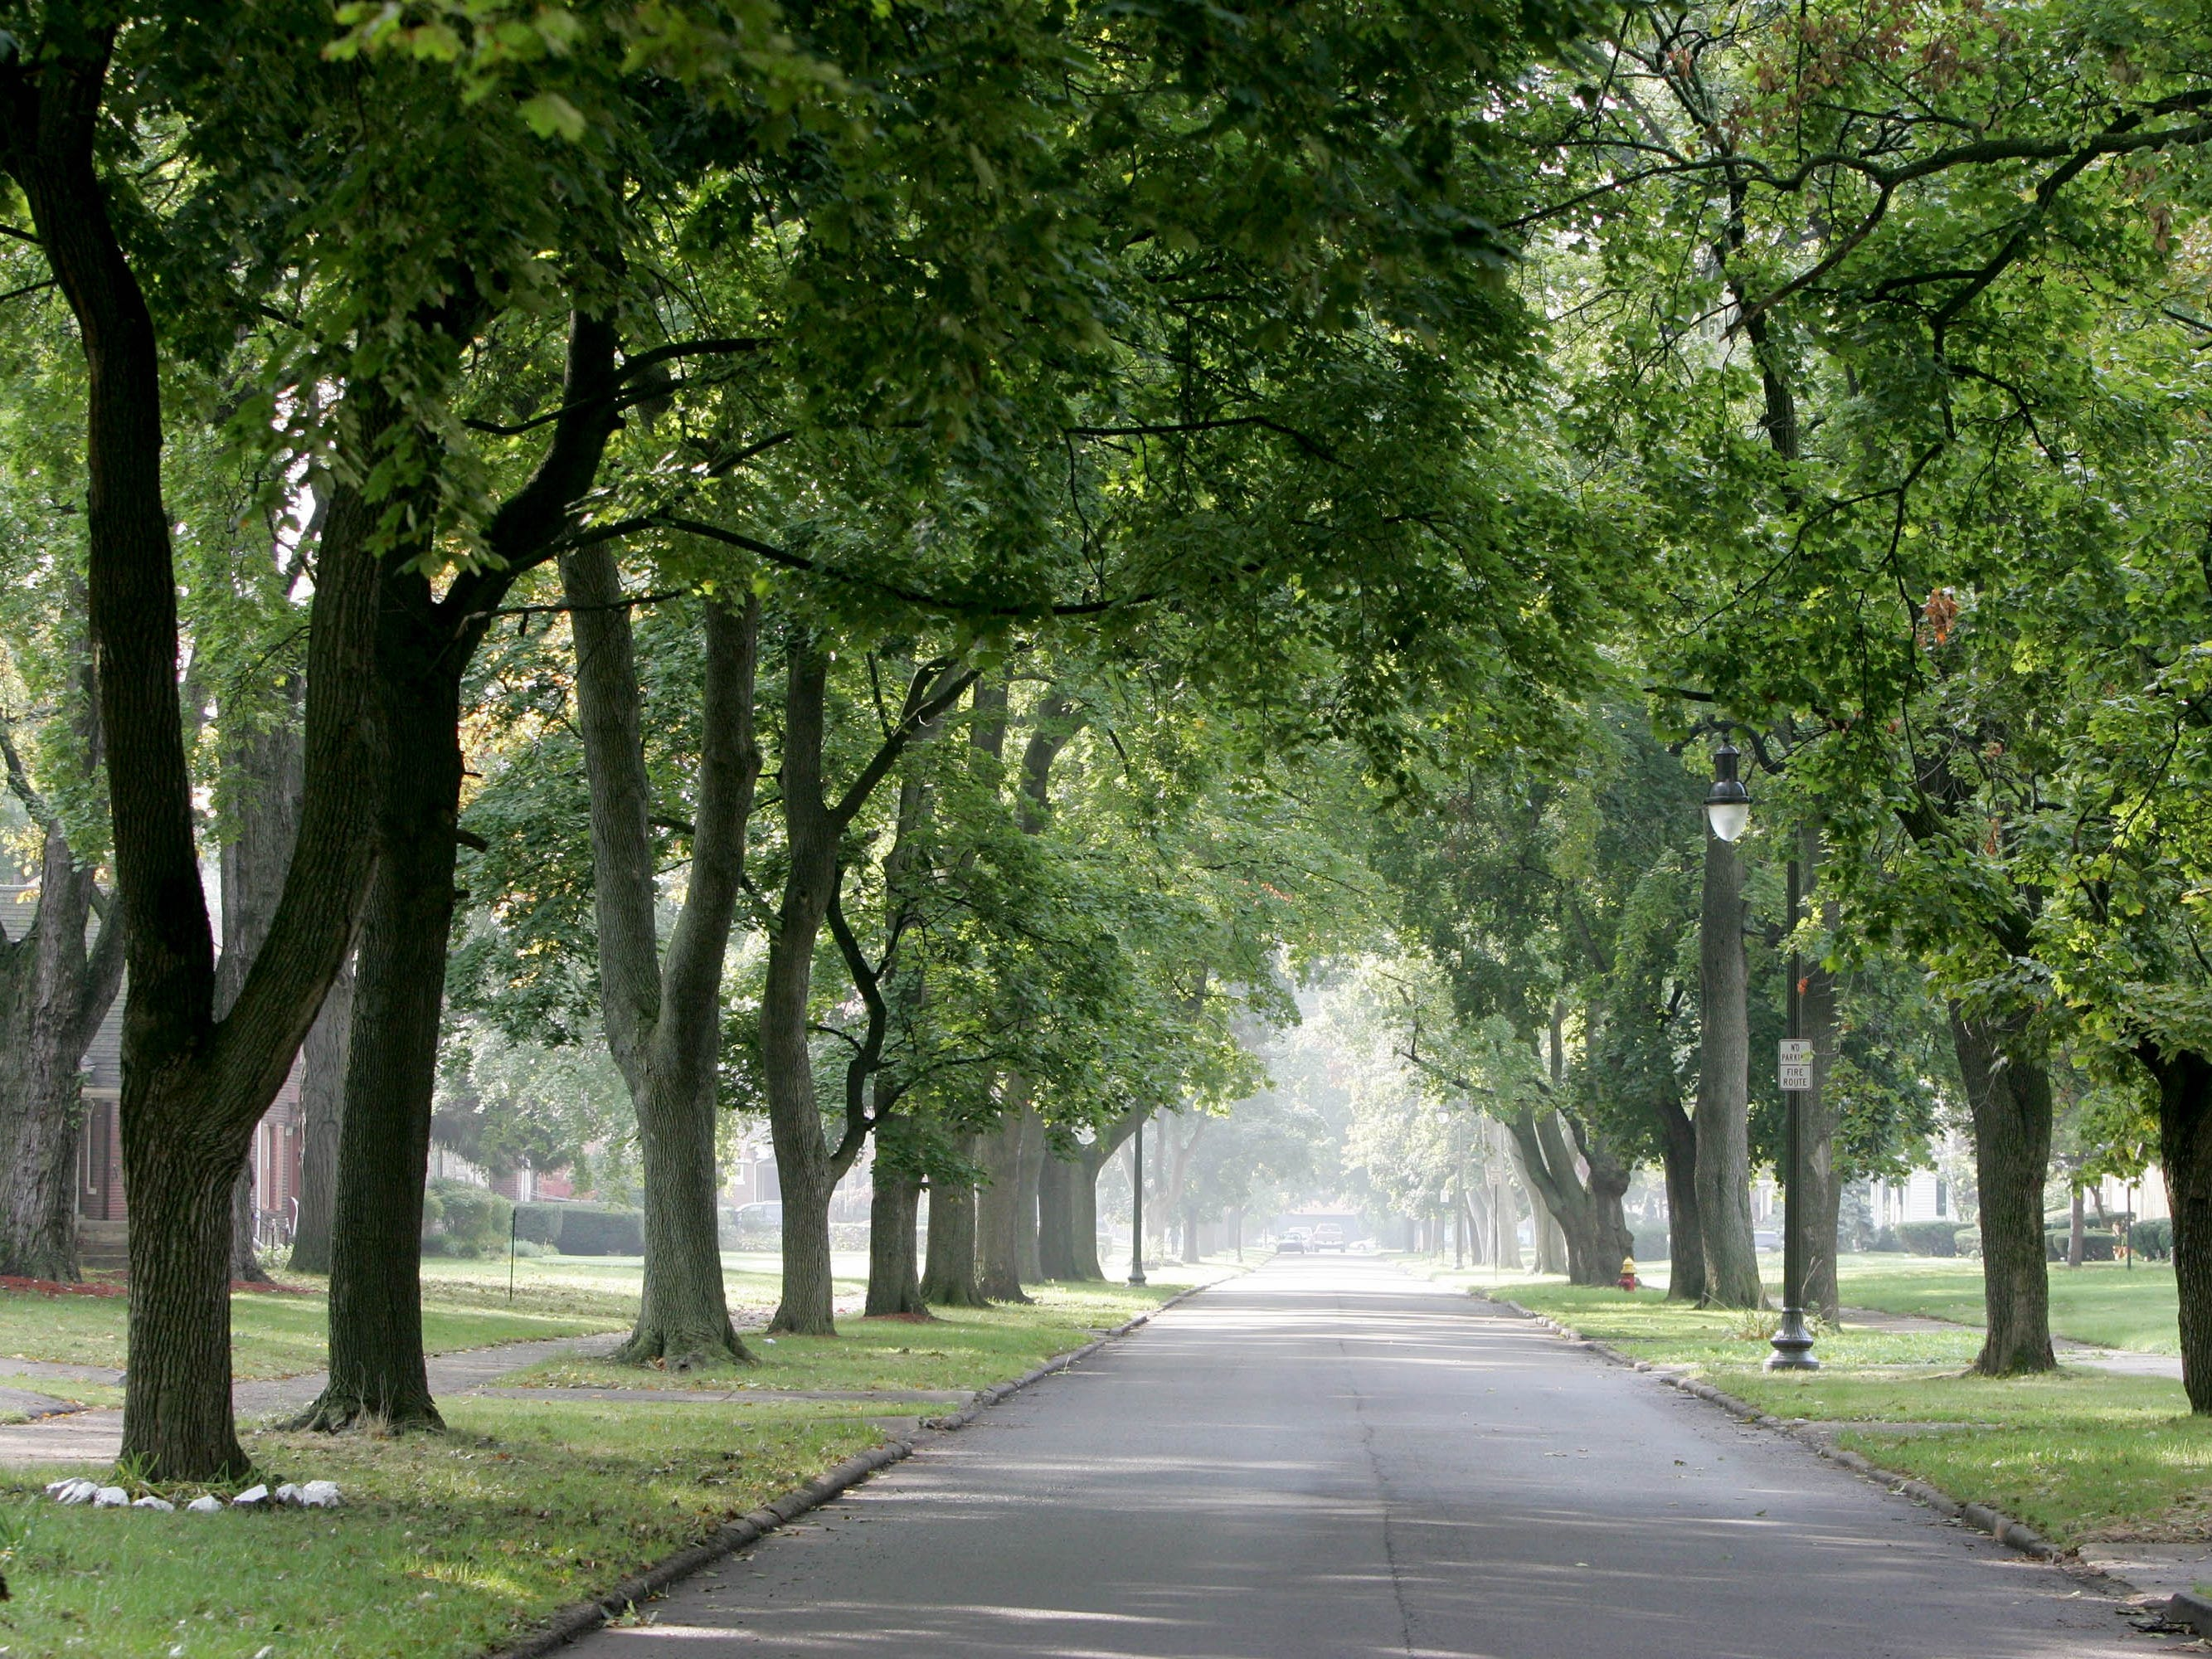 Michigan senator wants to cut local communities' control over trees